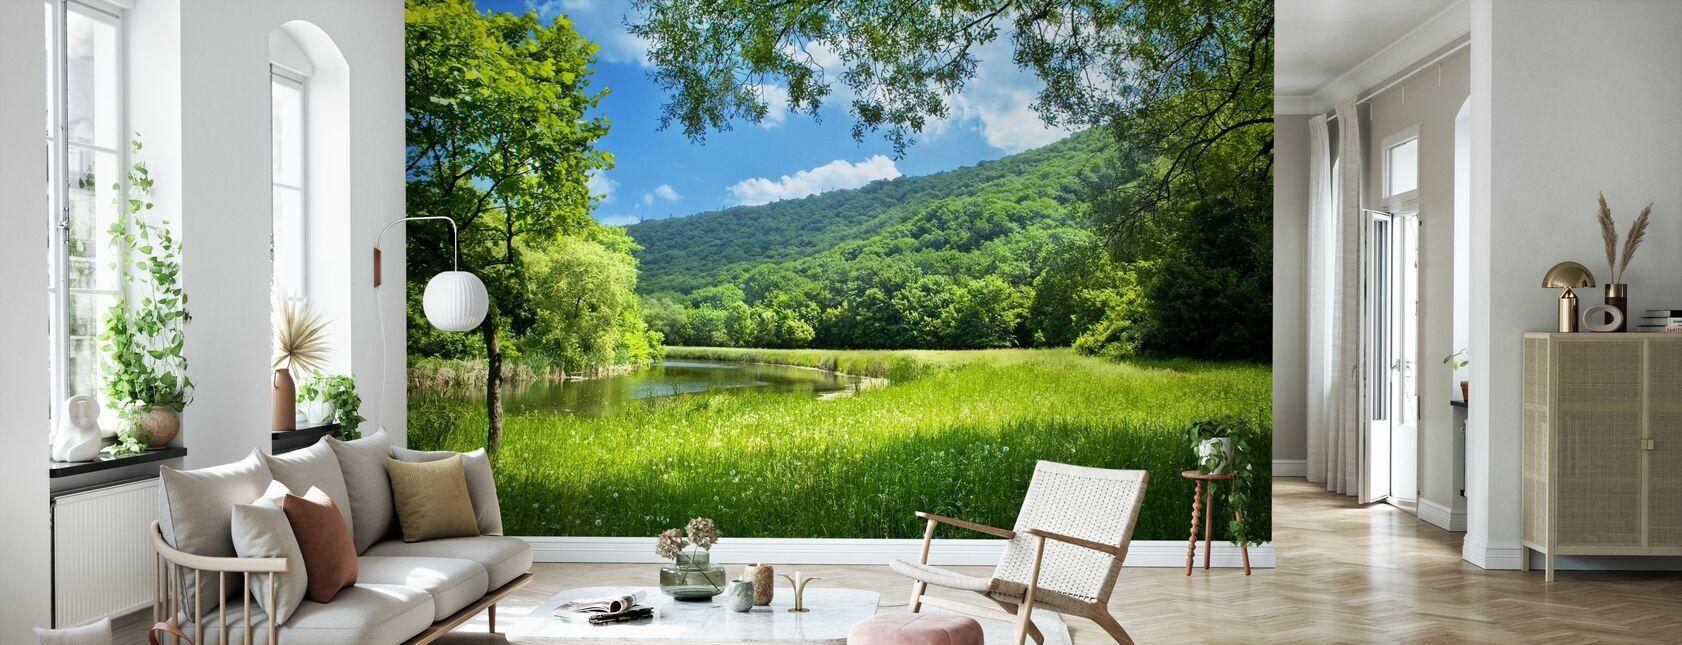 Summer Landscape with River - Wallpaper - Living Room